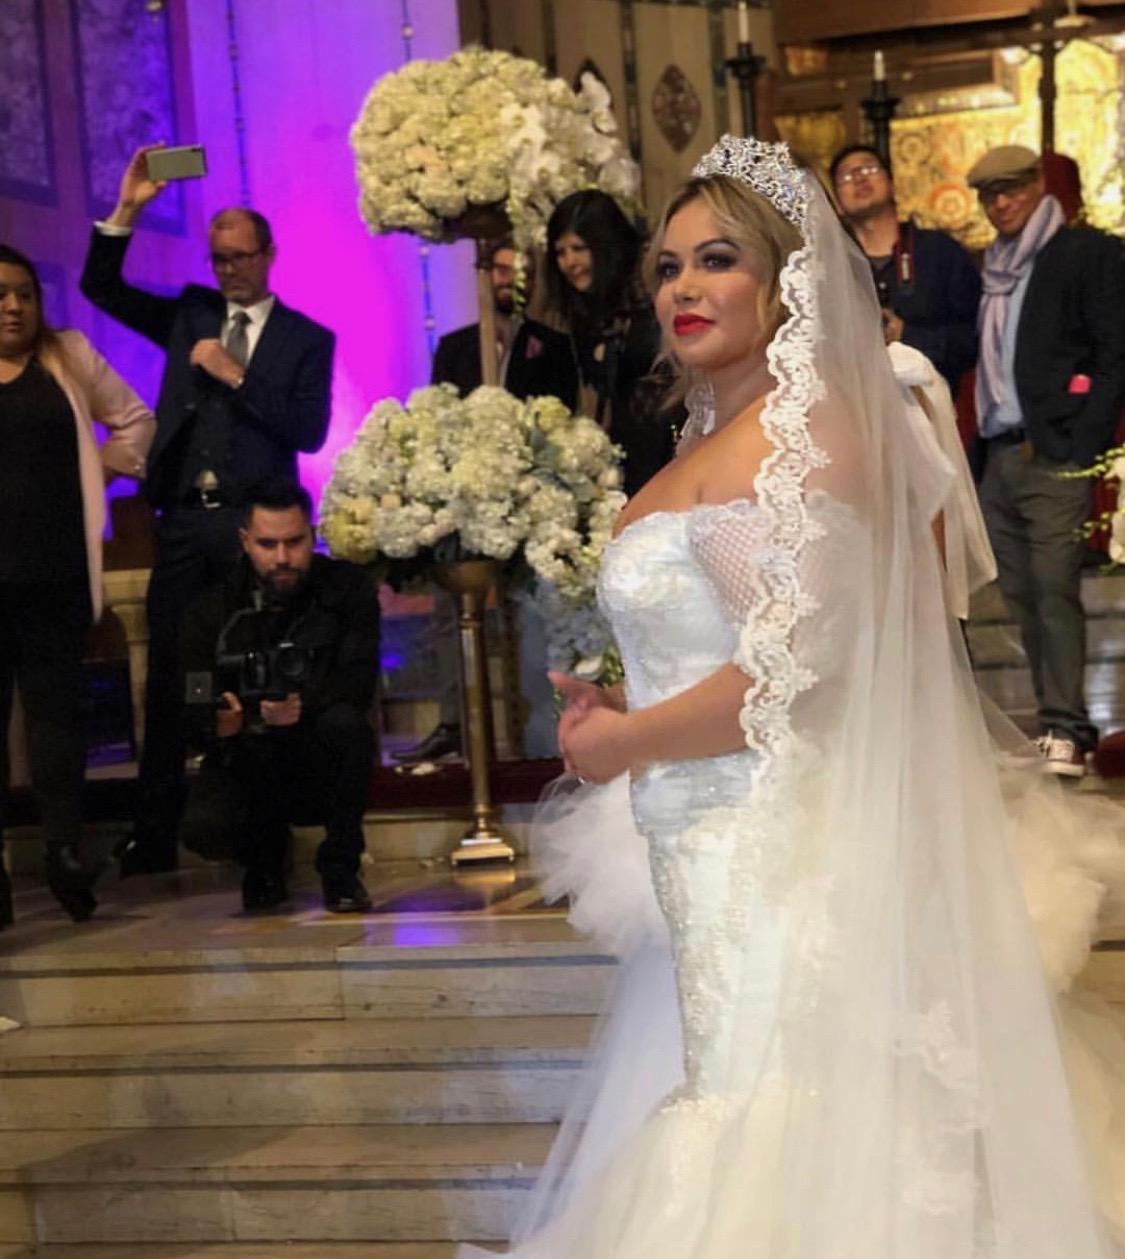 Chiquis Rivera Wedding: Chiquis Rivera Se Viste De Novia